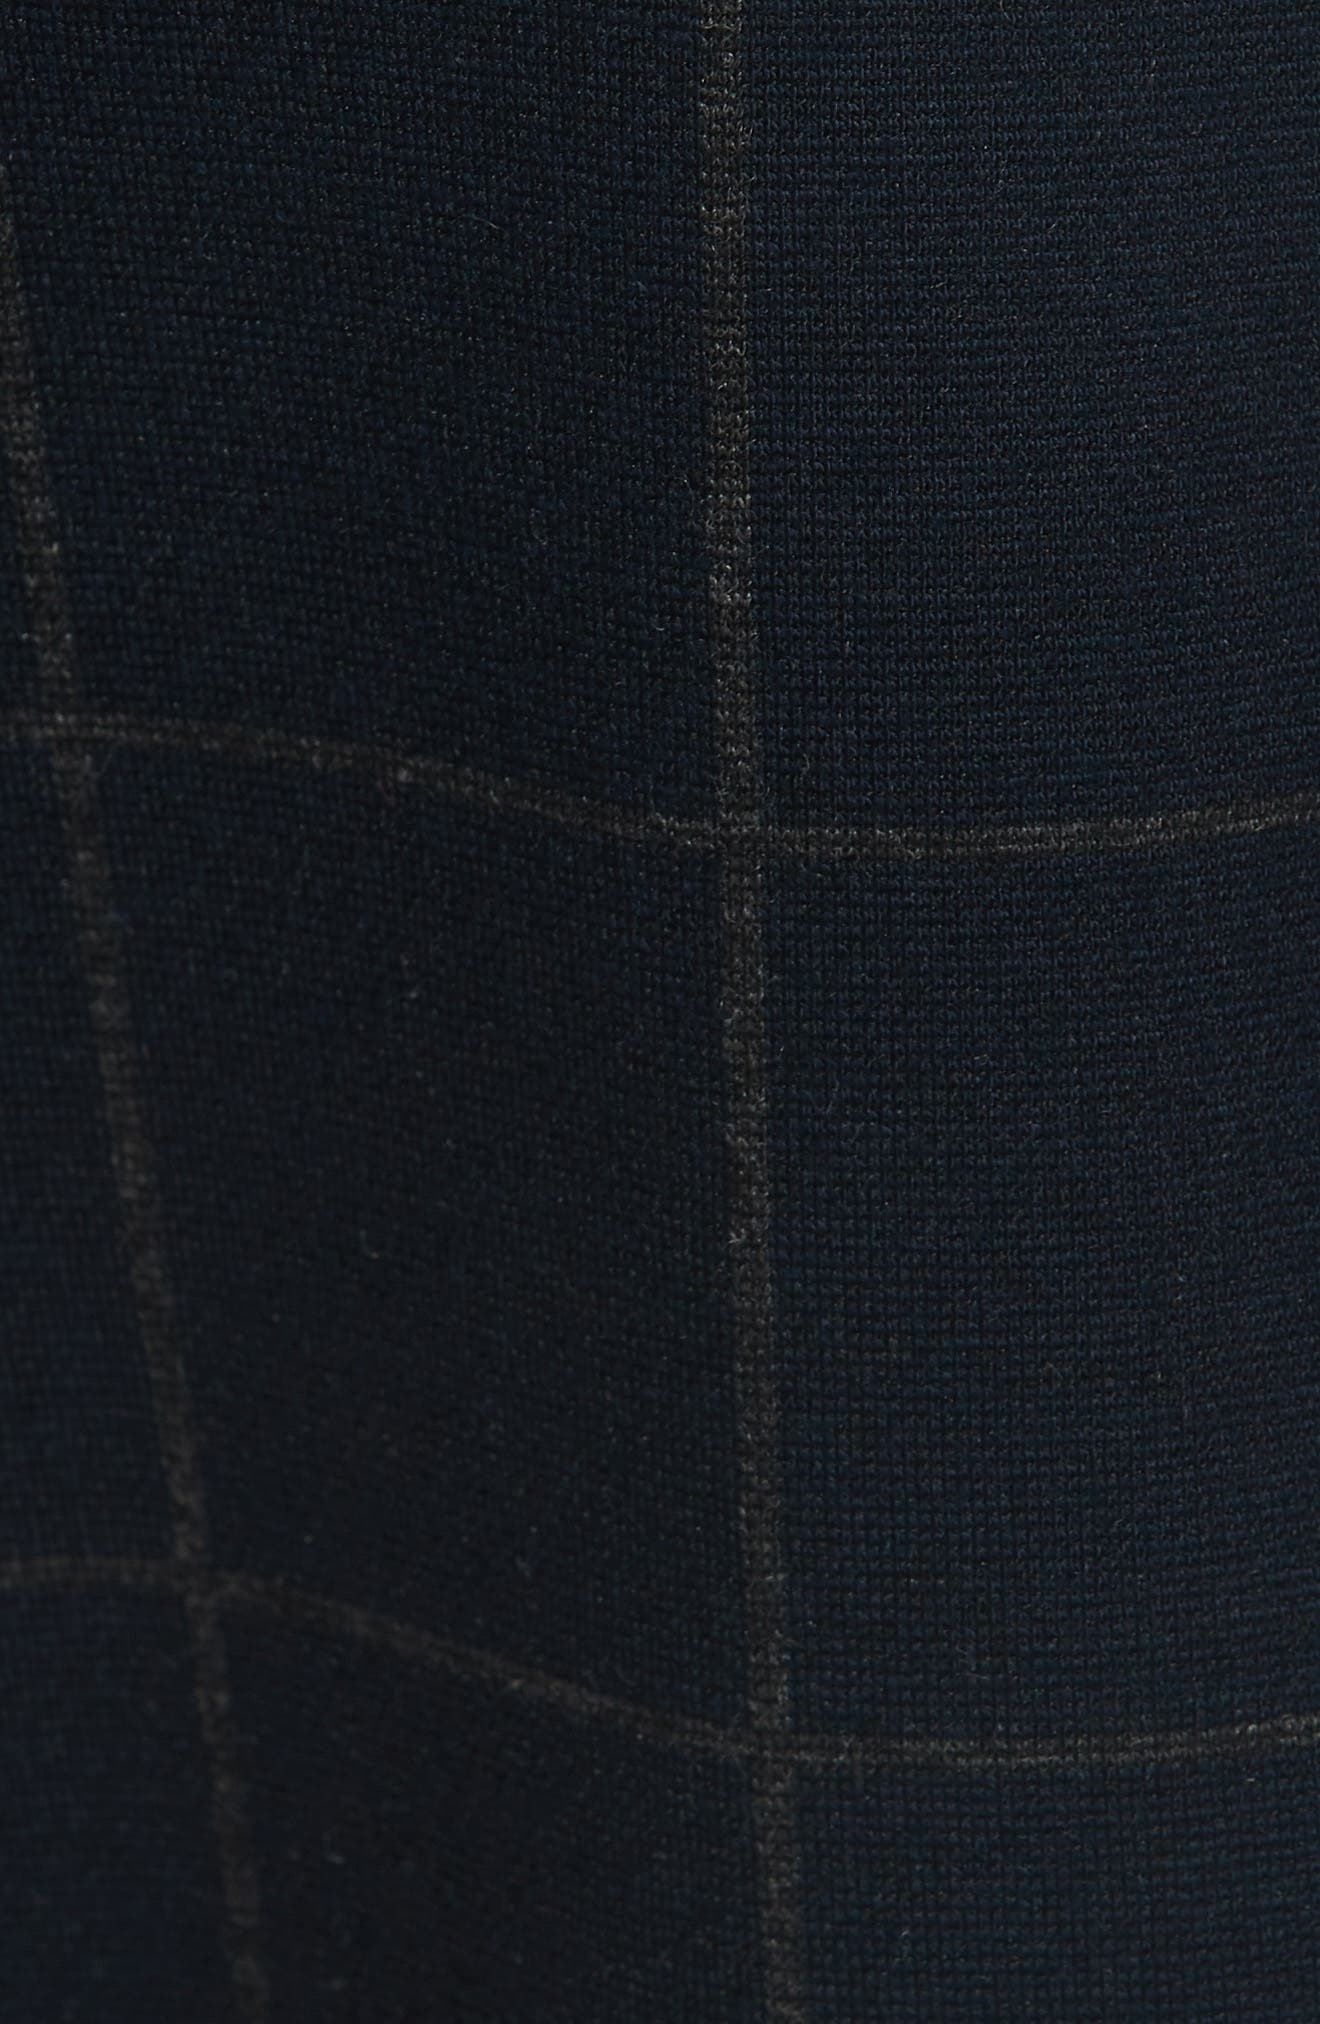 Windowpane Knit A-Line Dress,                             Alternate thumbnail 5, color,                             DEEP NAVY/ CHARCOAL MELANGE